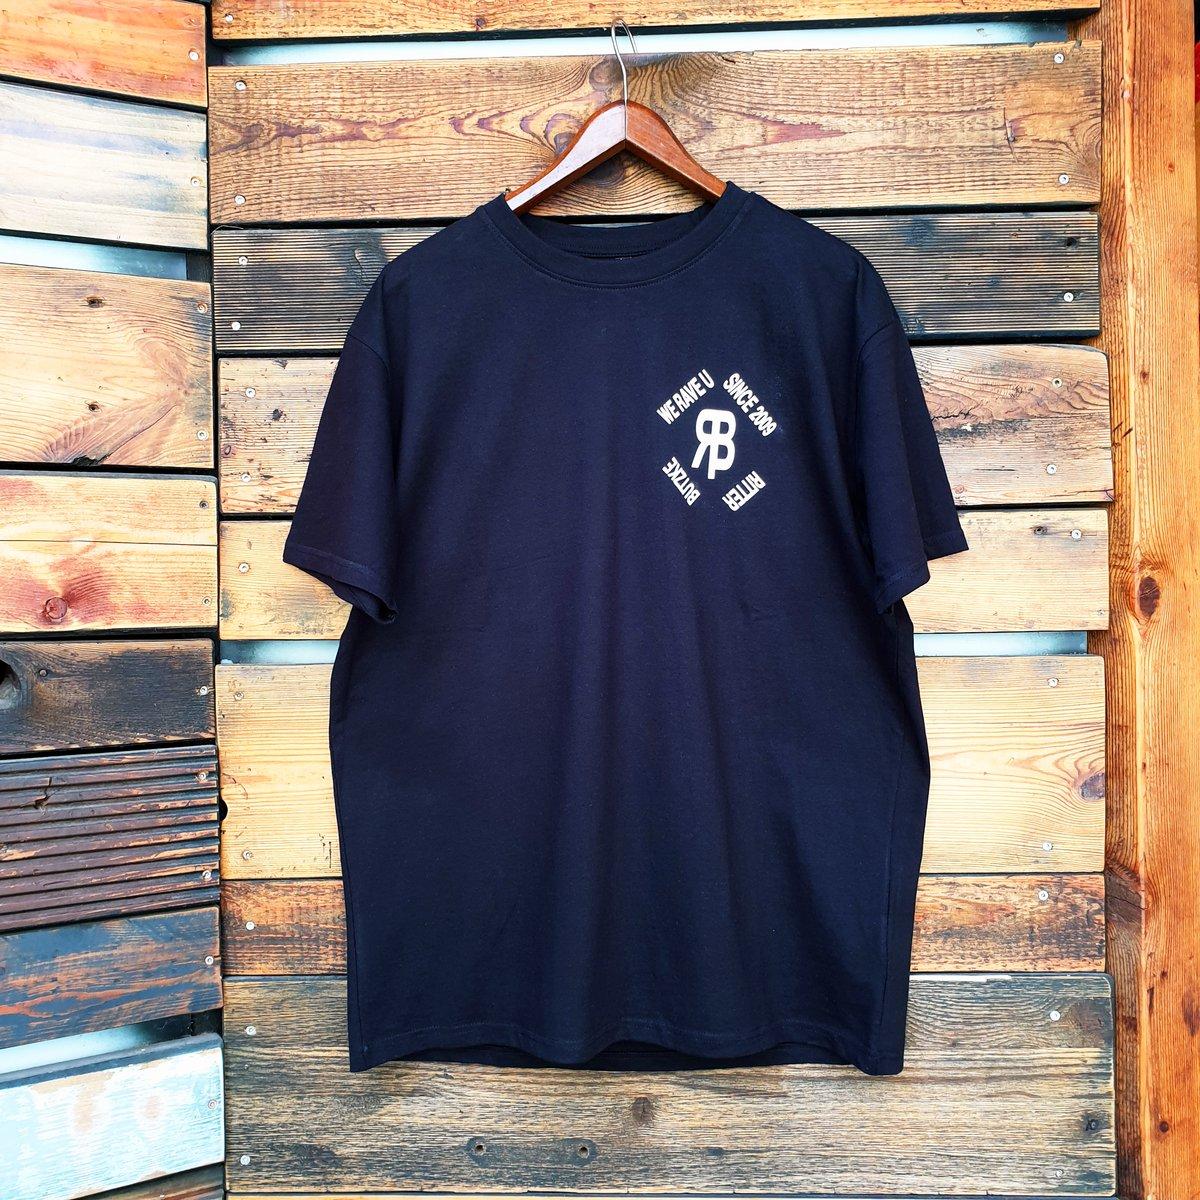 """We Rave You"" Shirt - Designed by Niconé"